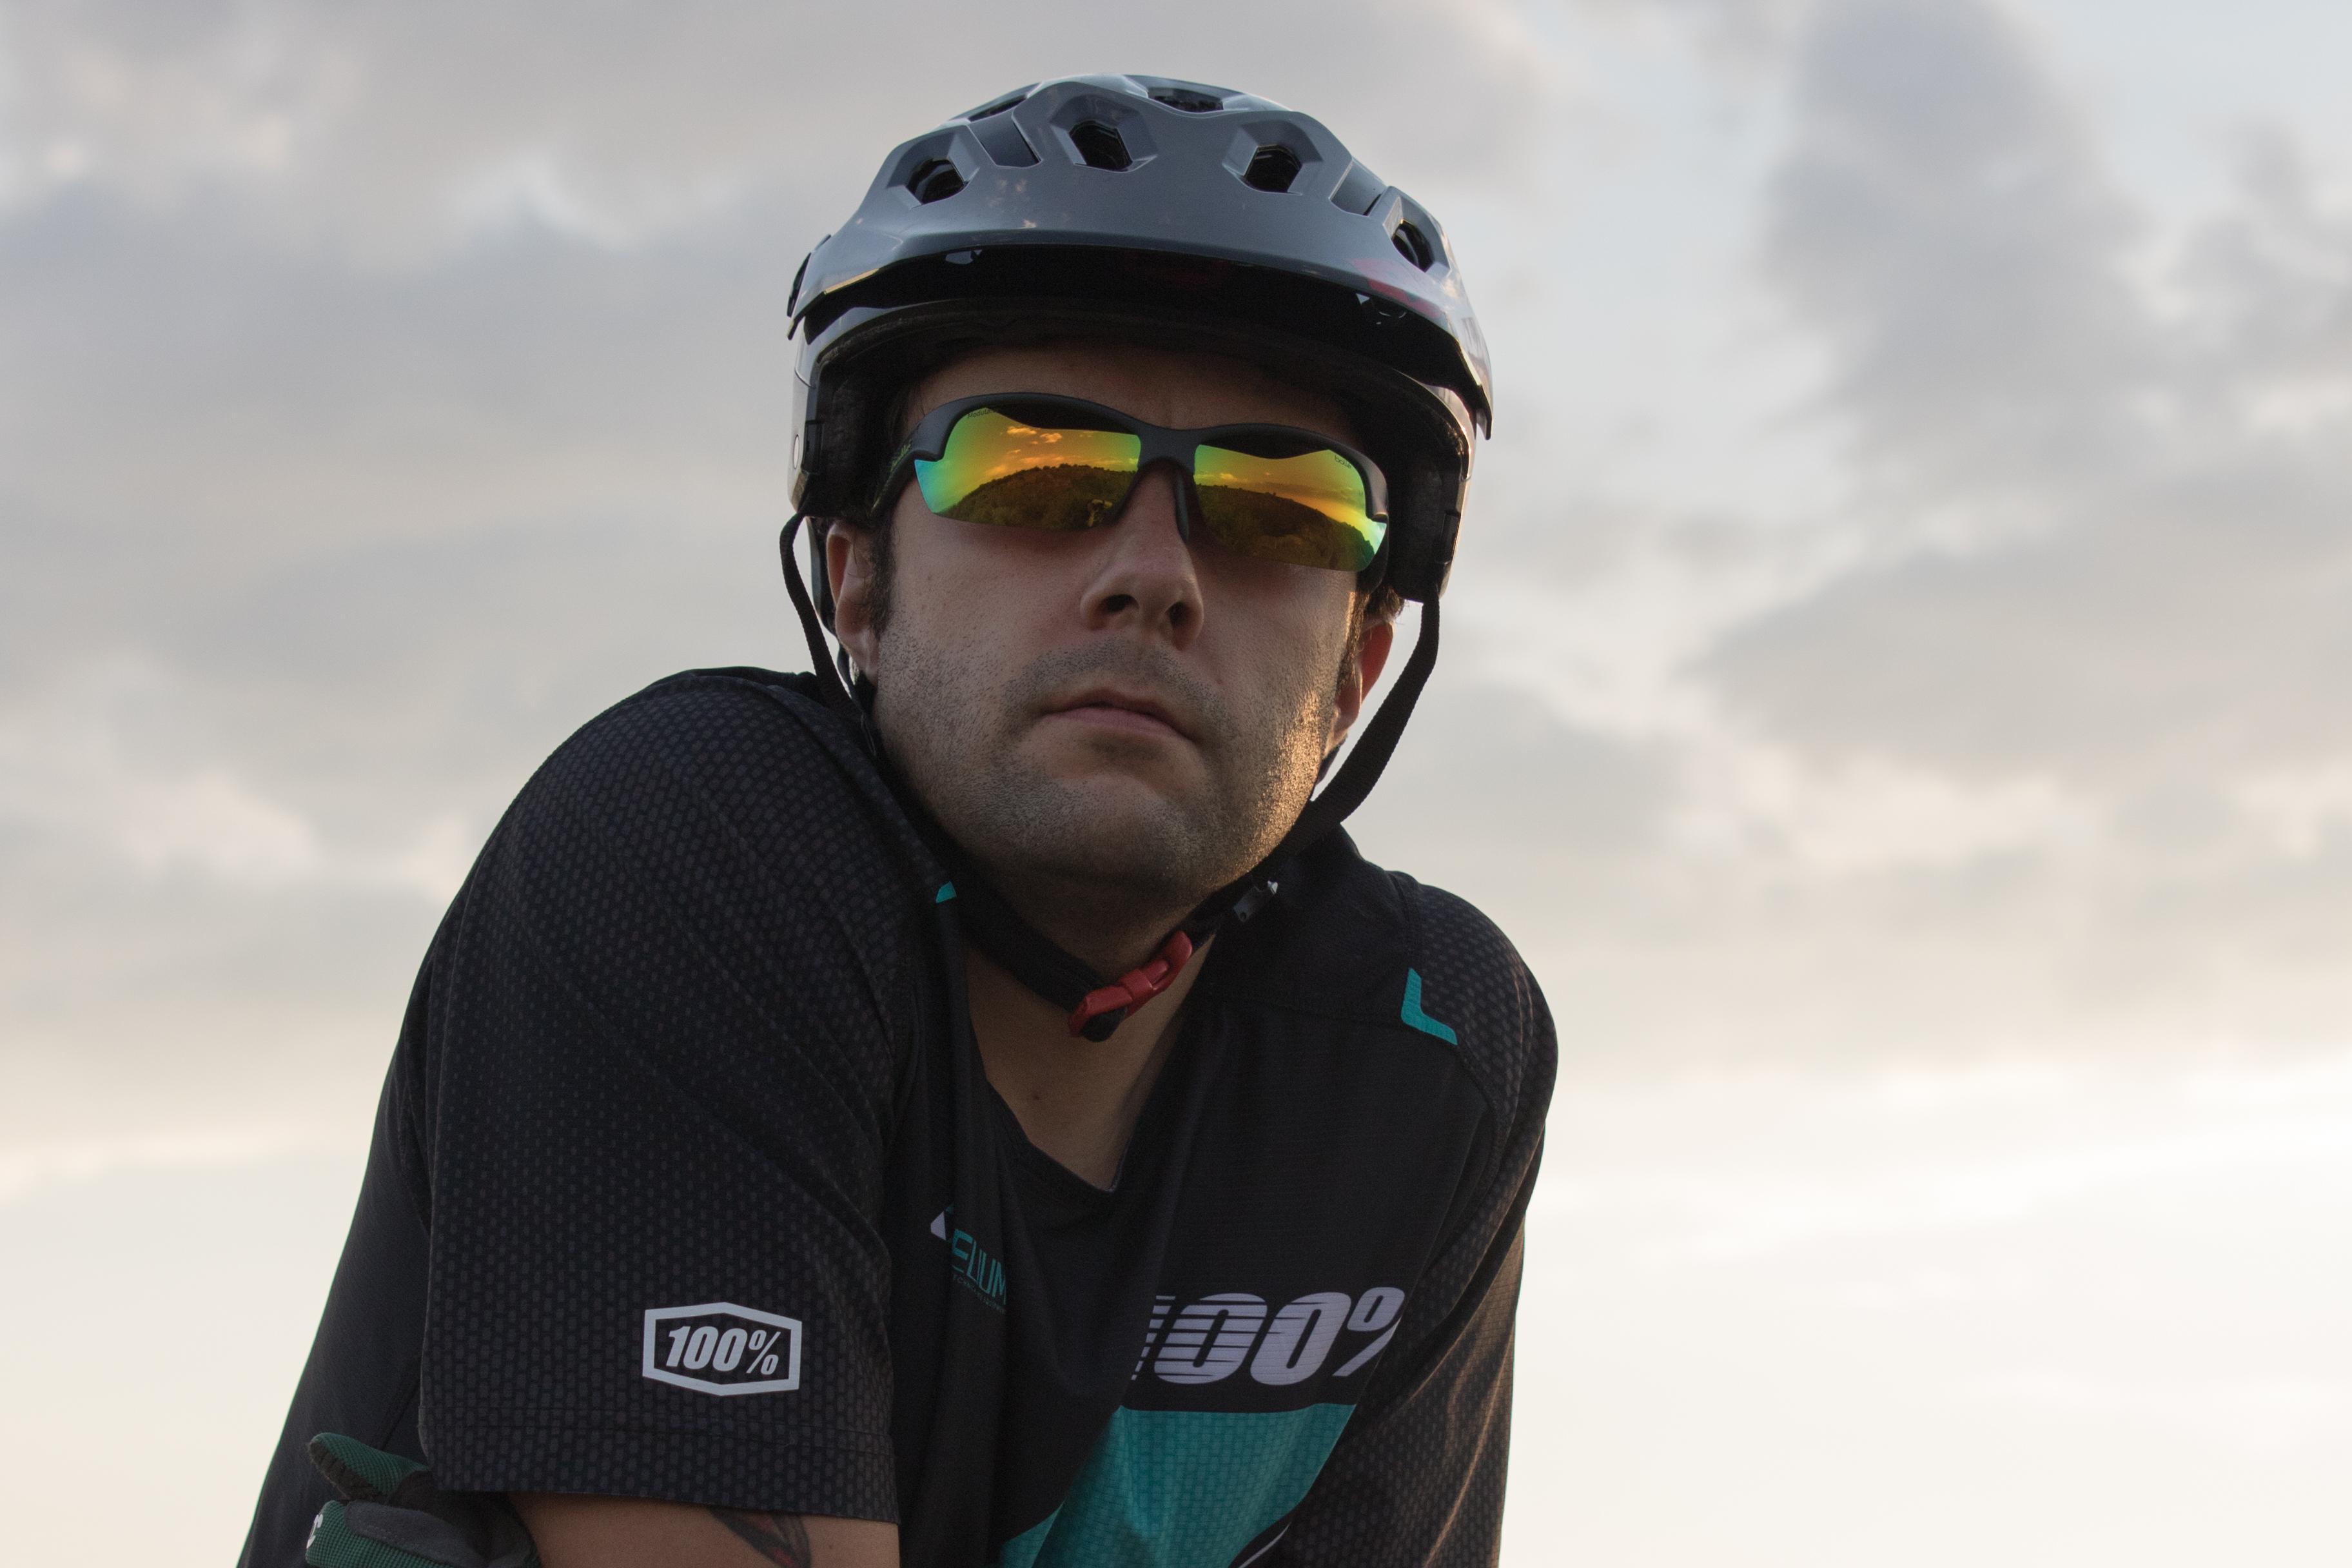 e350aa18c5 ... 2432 in 6 Performance Sunglasses for Mountain Biking ...